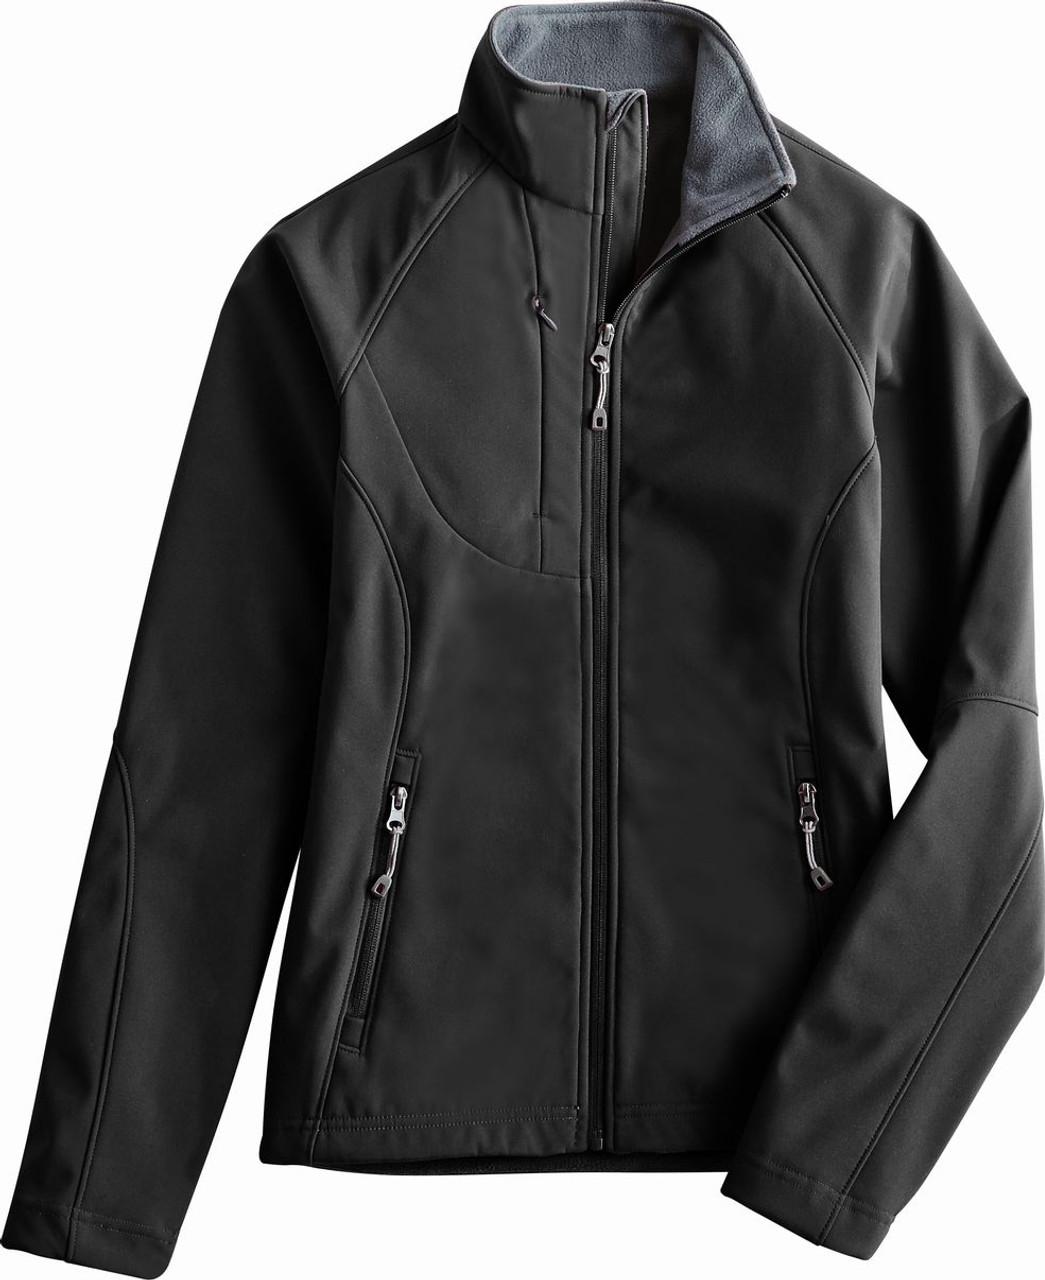 Ladies  MATRIX Bonded Soft-Shell Jacket - DOS Logo - BKK Inc.  FARA ... d9deb1f6ec